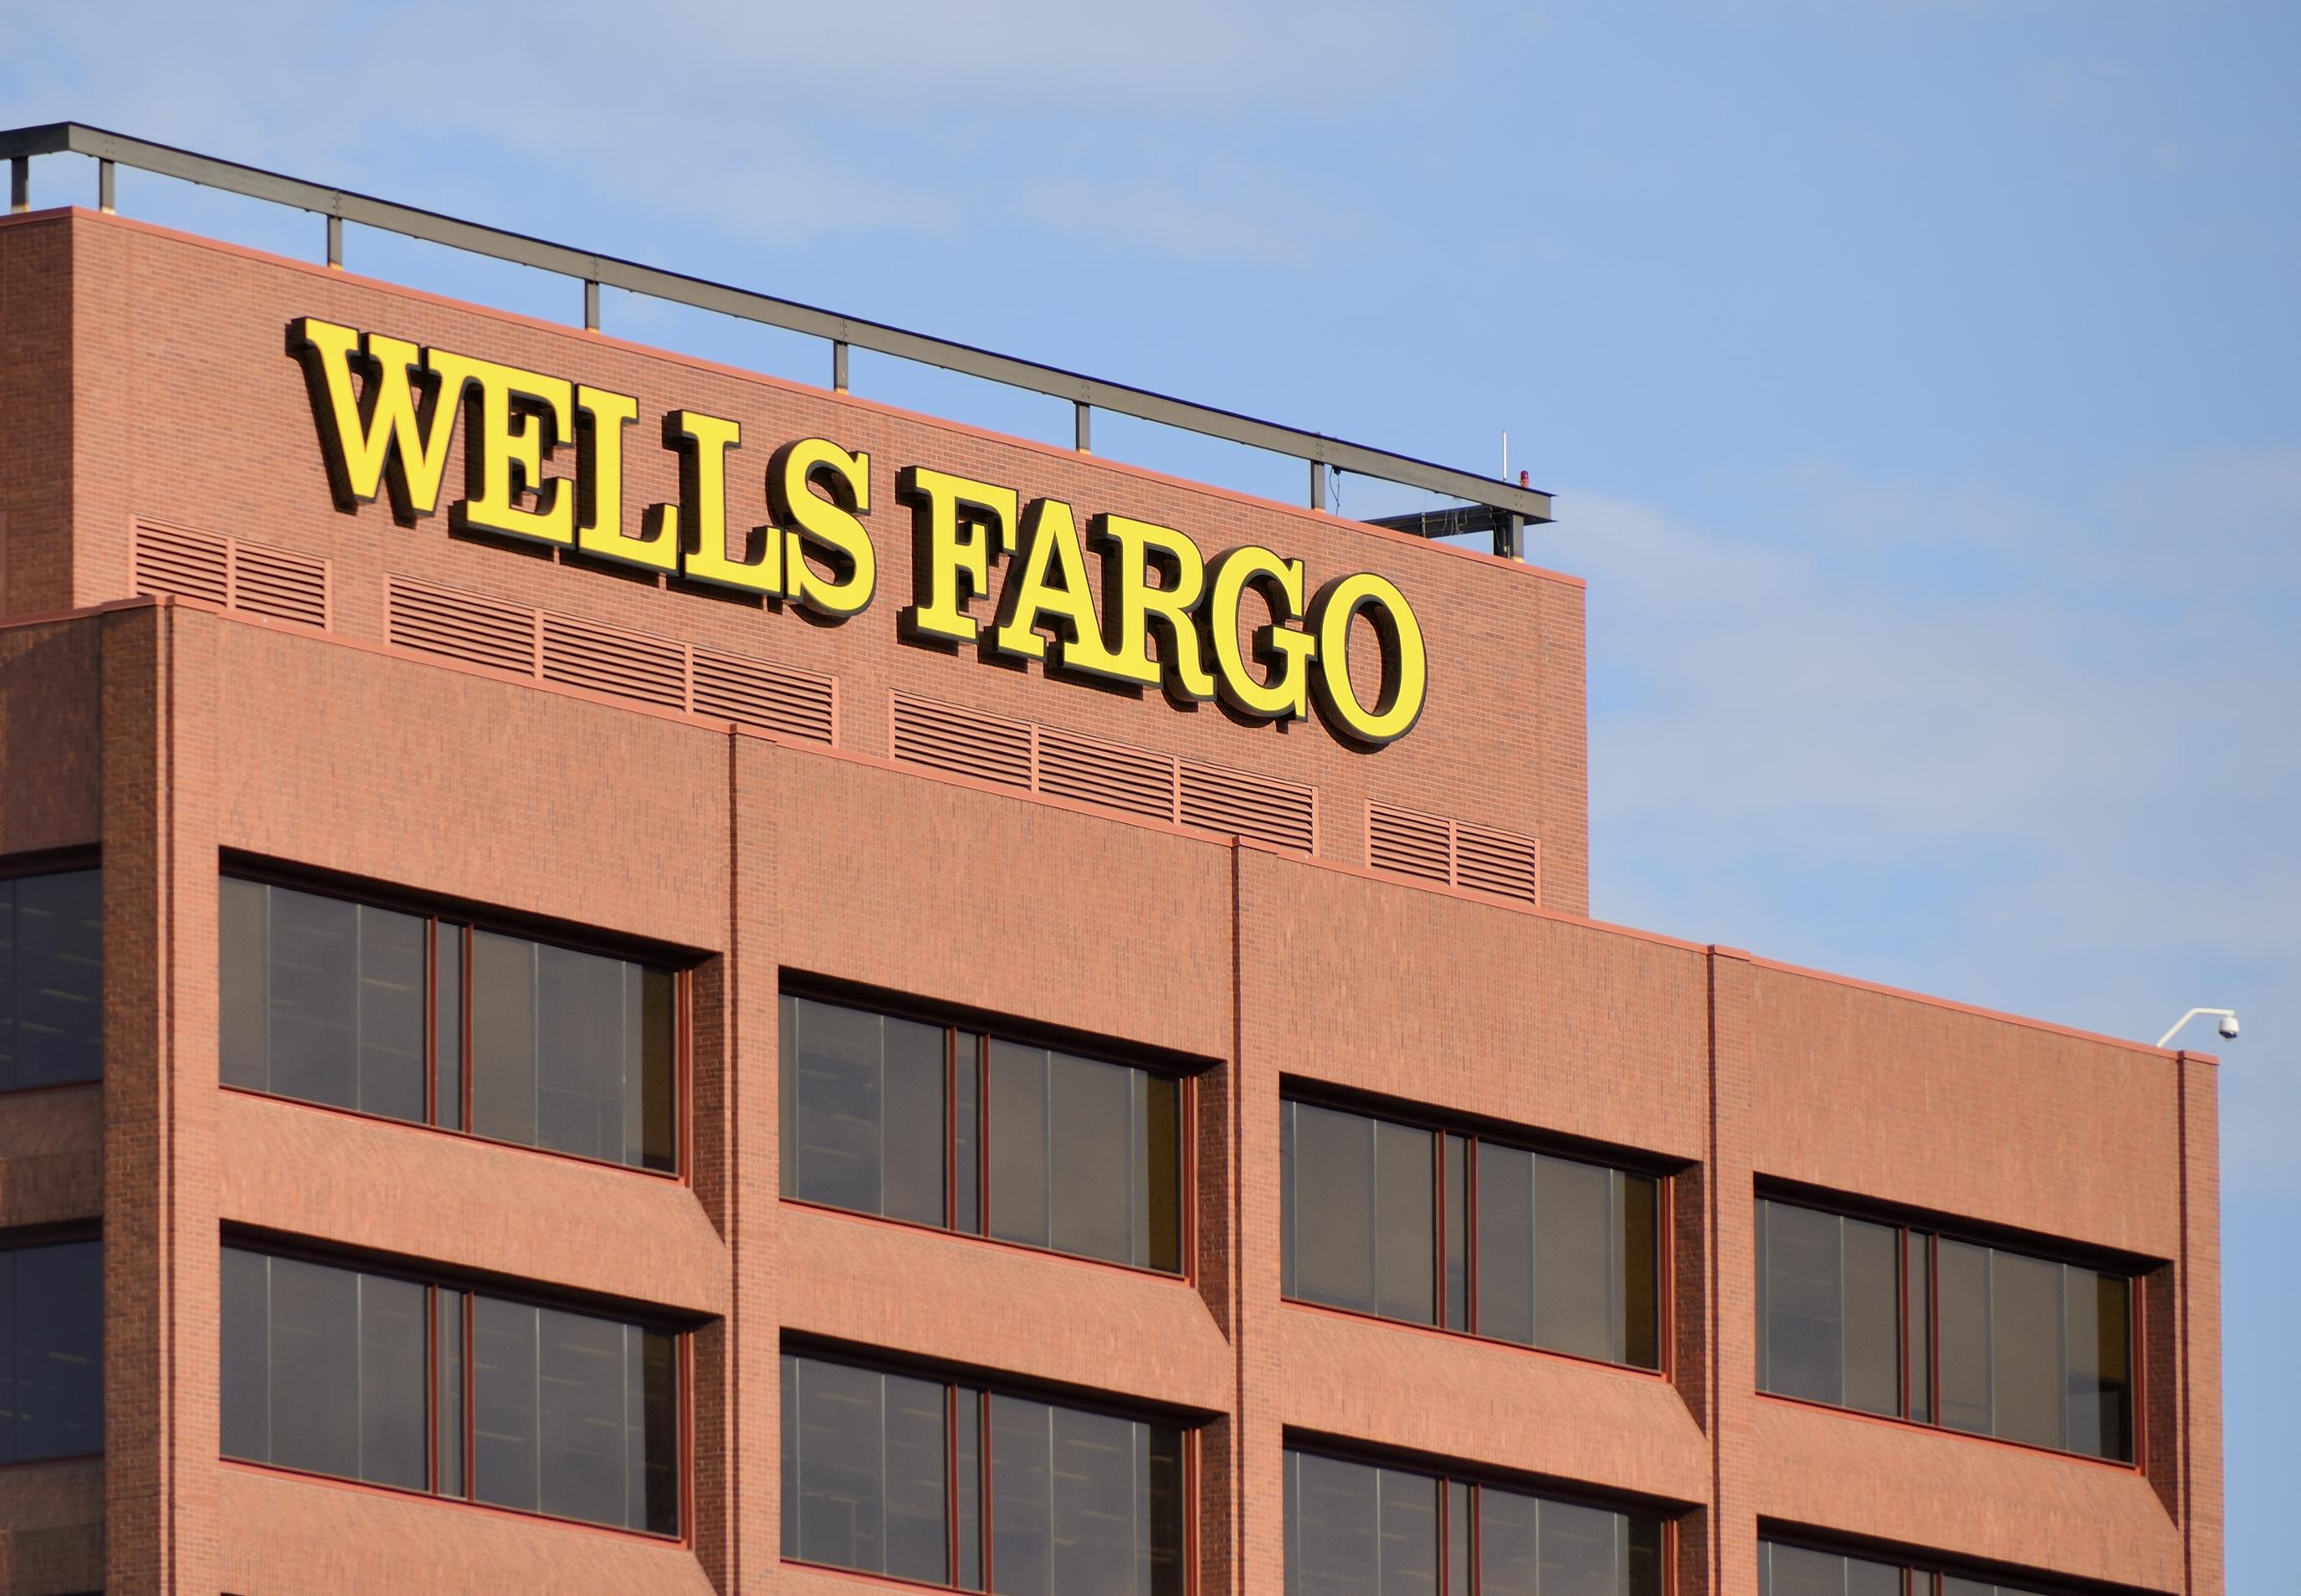 A Wells Fargo building in Philadelphia.